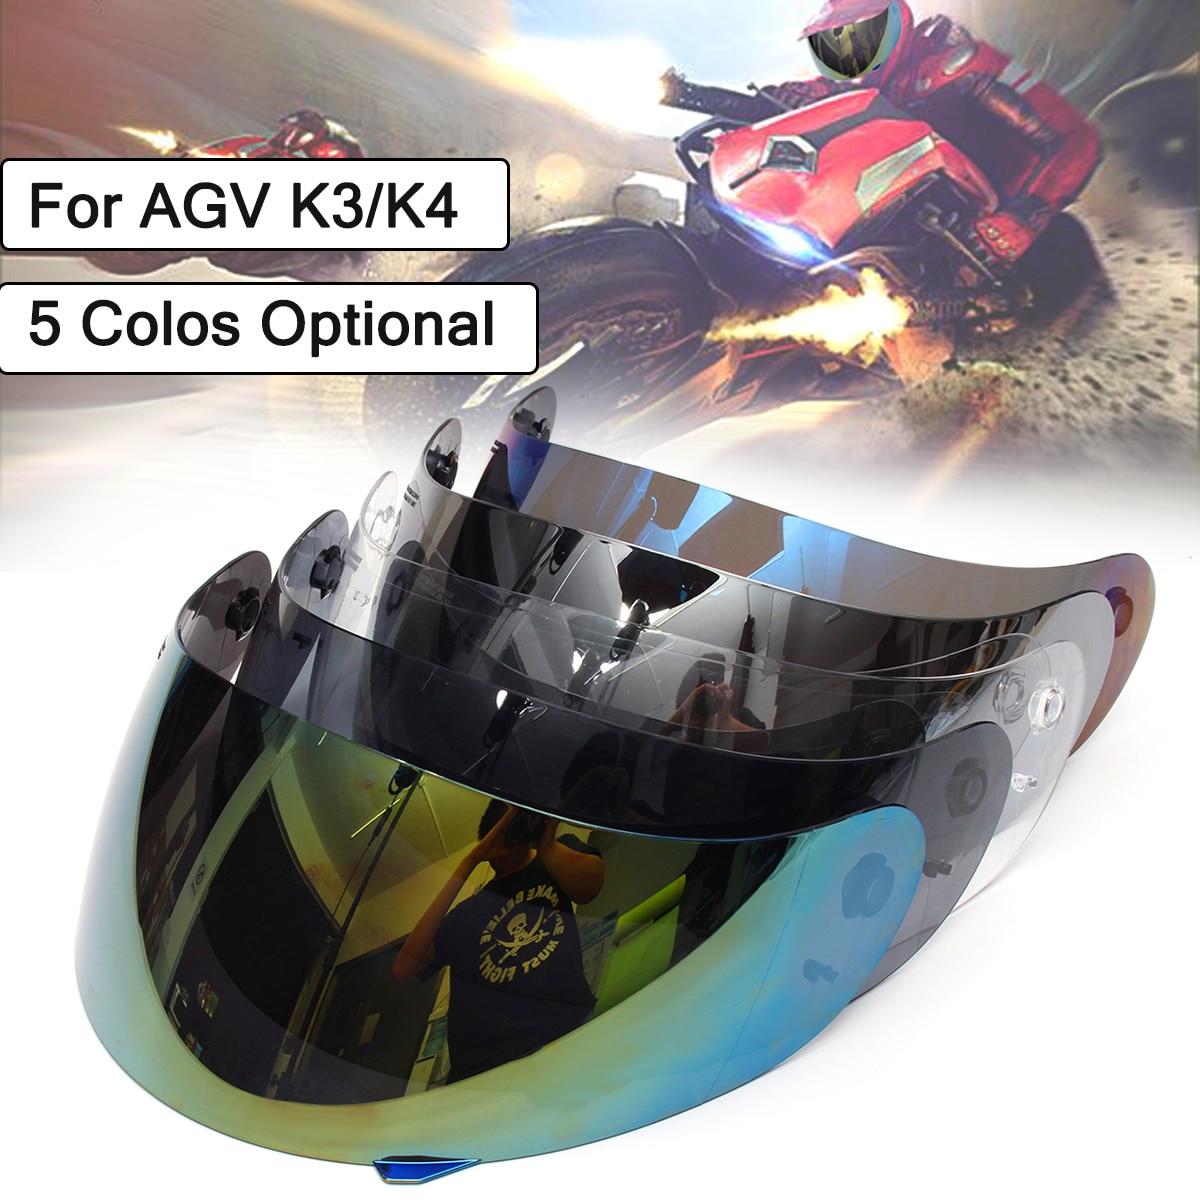 Buy Agv K3 And Get Free Shipping On Visor Helm